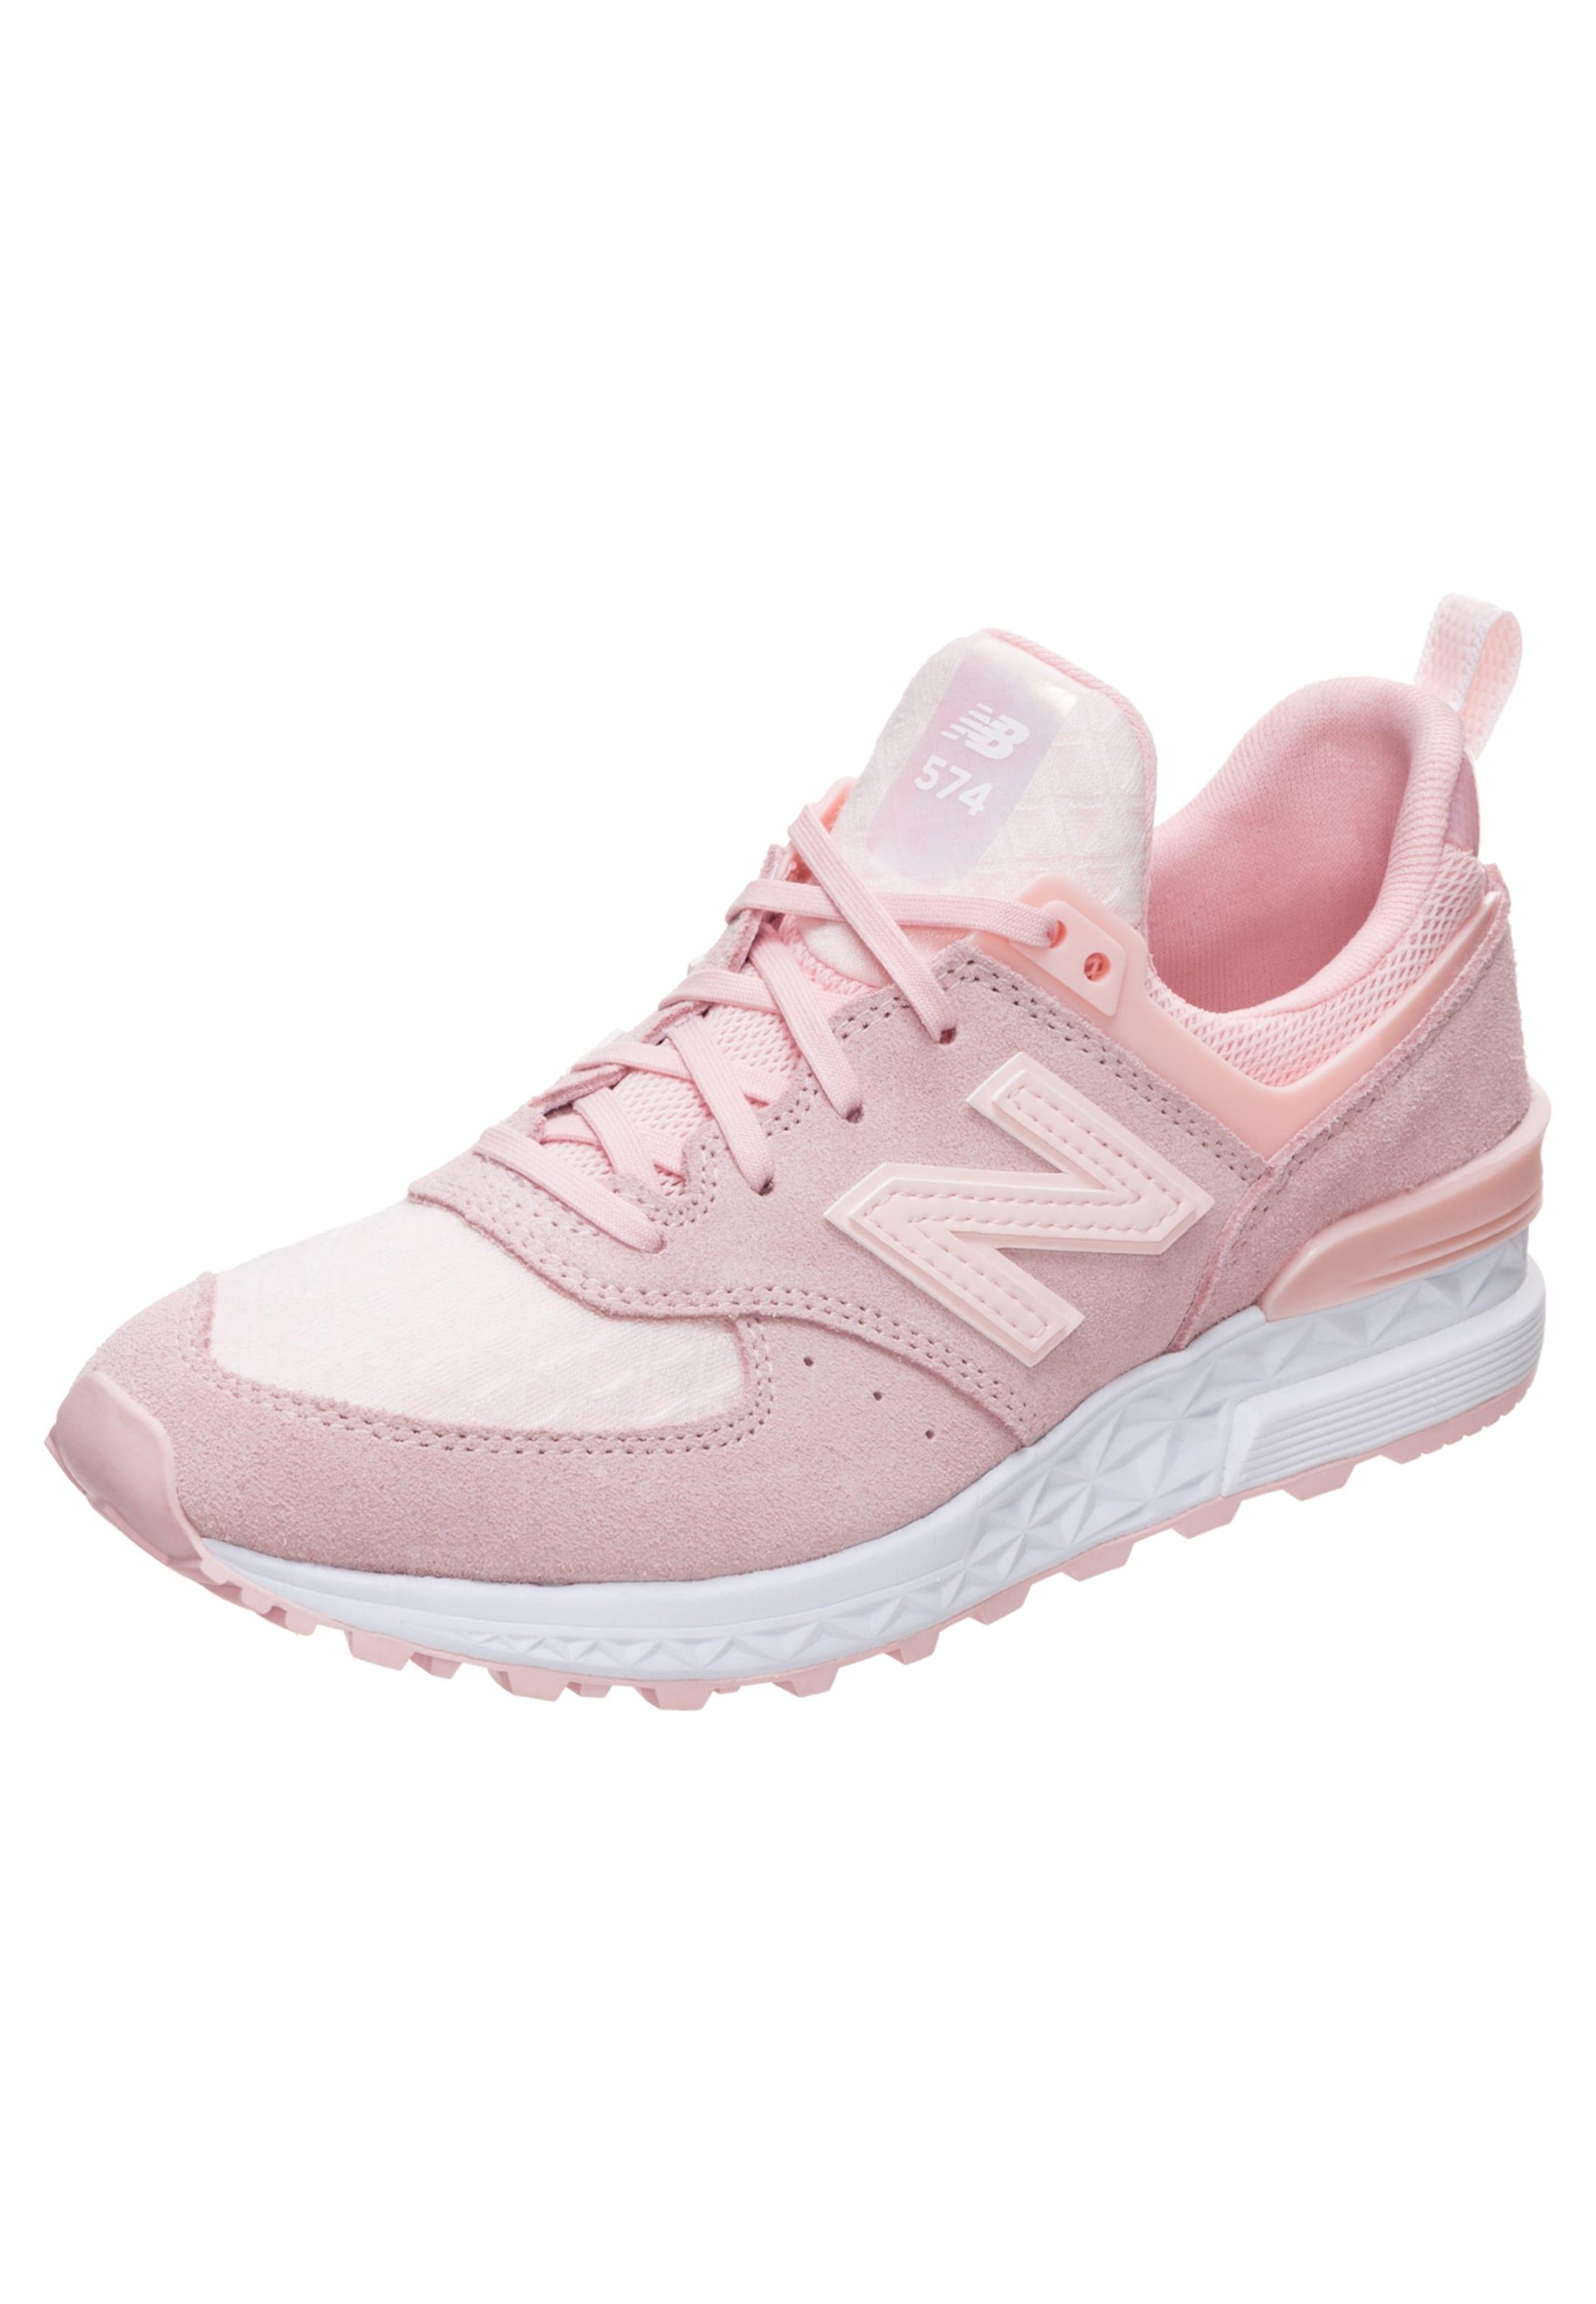 new balance WS574-SNC-B Sneaker Verschleißfeste billige Schuhe